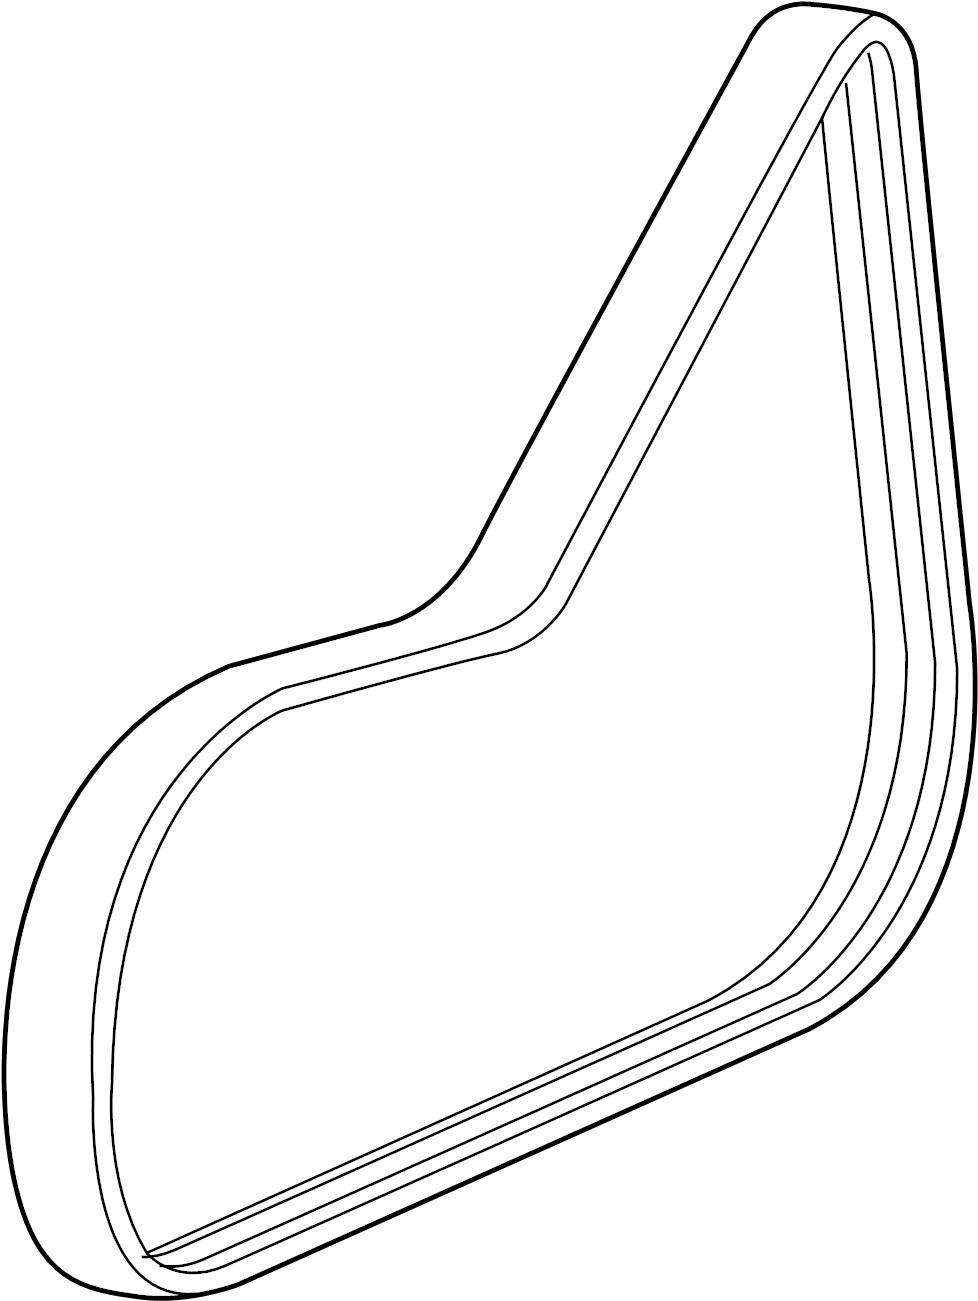 2006 chevrolet ac belt  belt  belt c cmpr  serpentine belt  chevrolet  pontiac